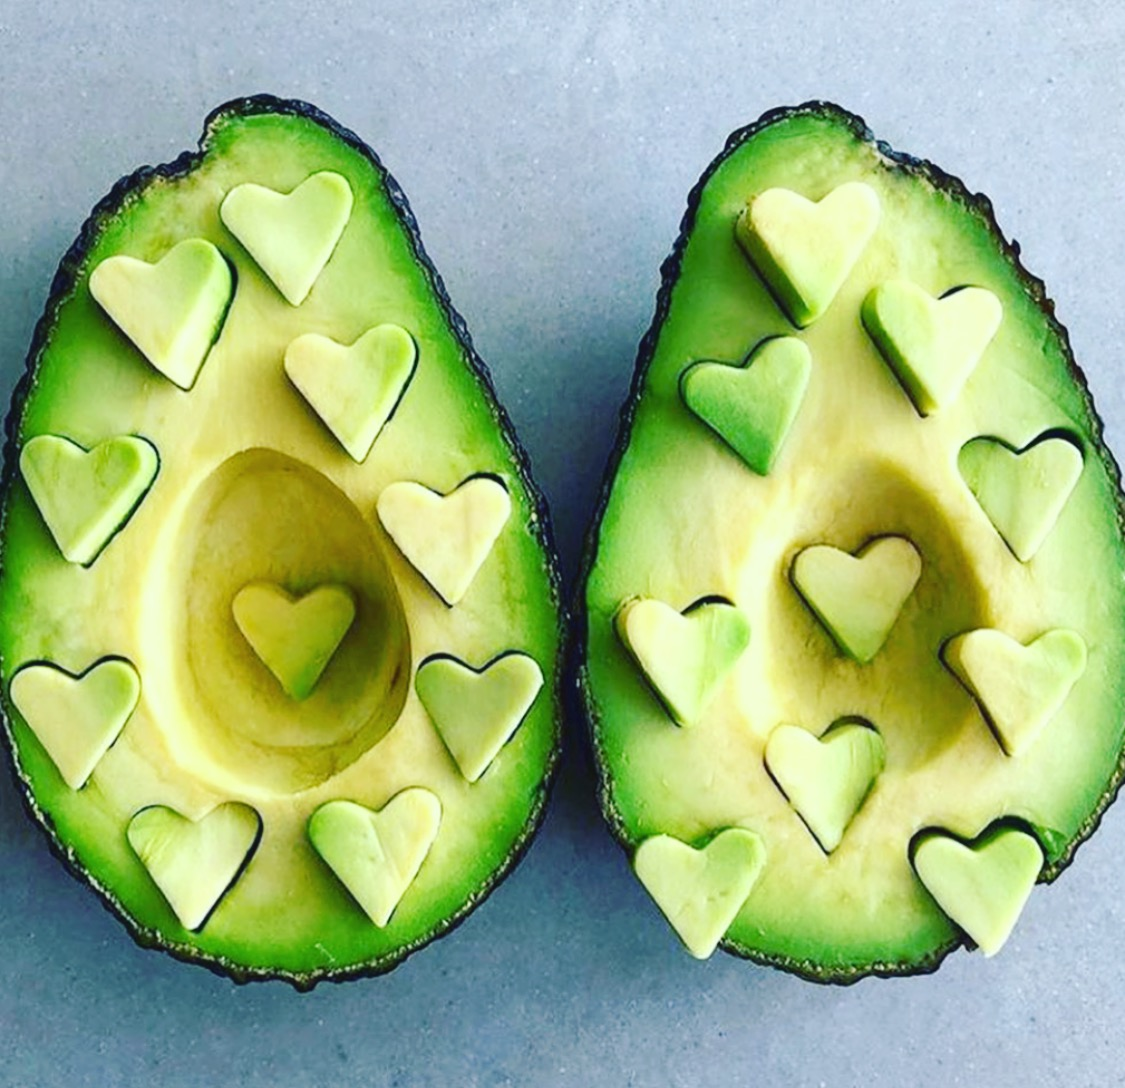 Avocado for Heart Health Month